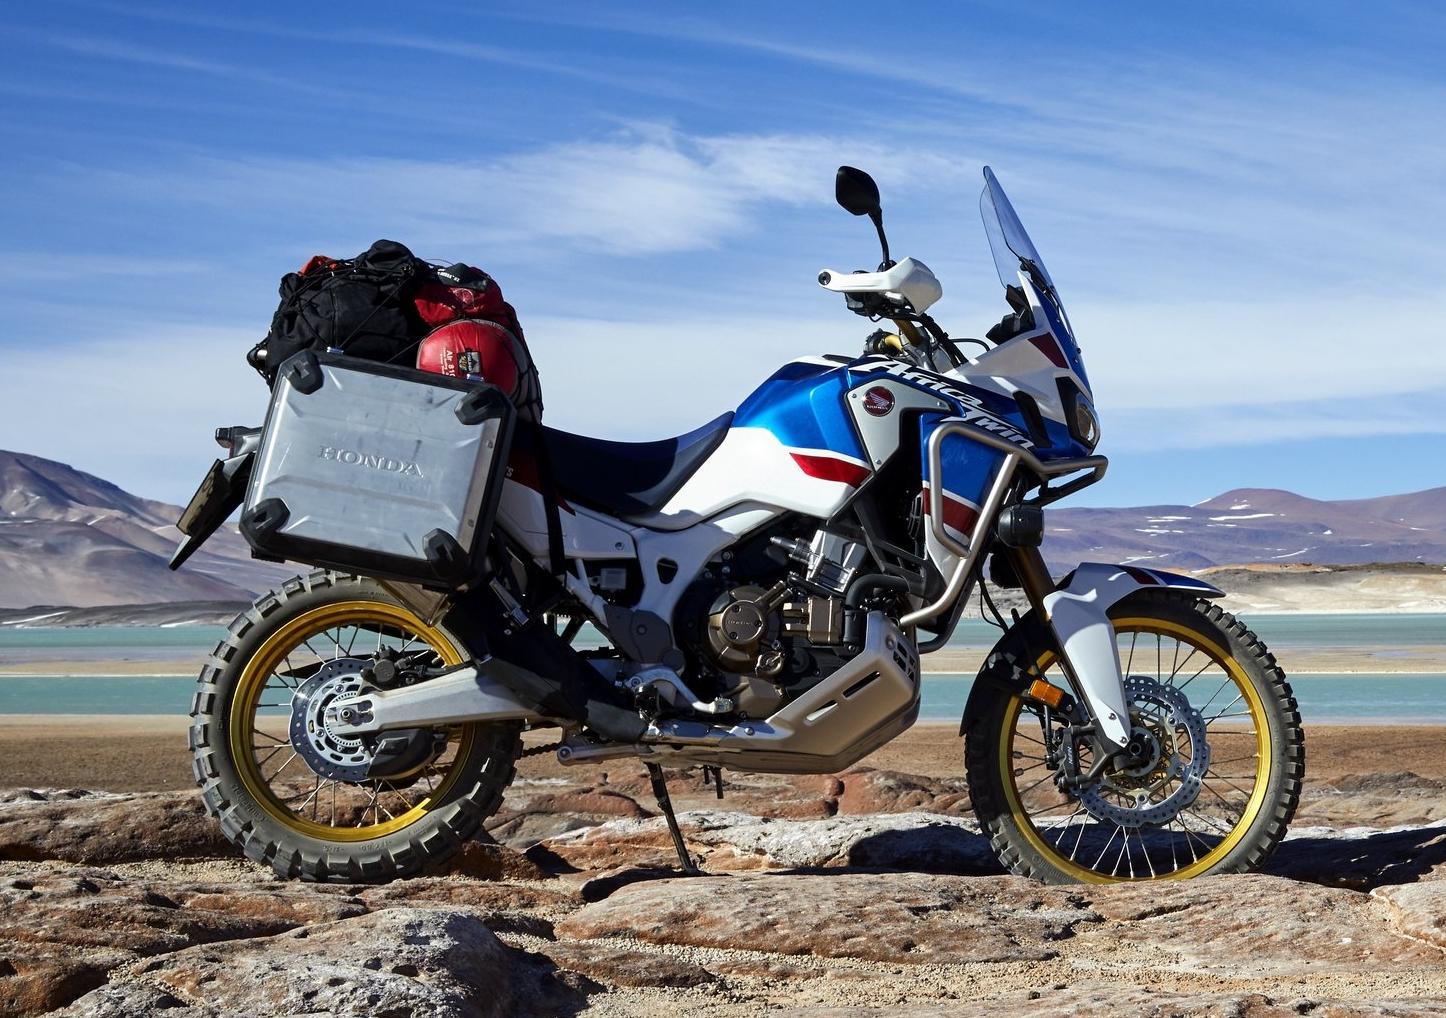 18_Honda_Africa_Twin_Adventure_Sports_Action_Image_10.jpg